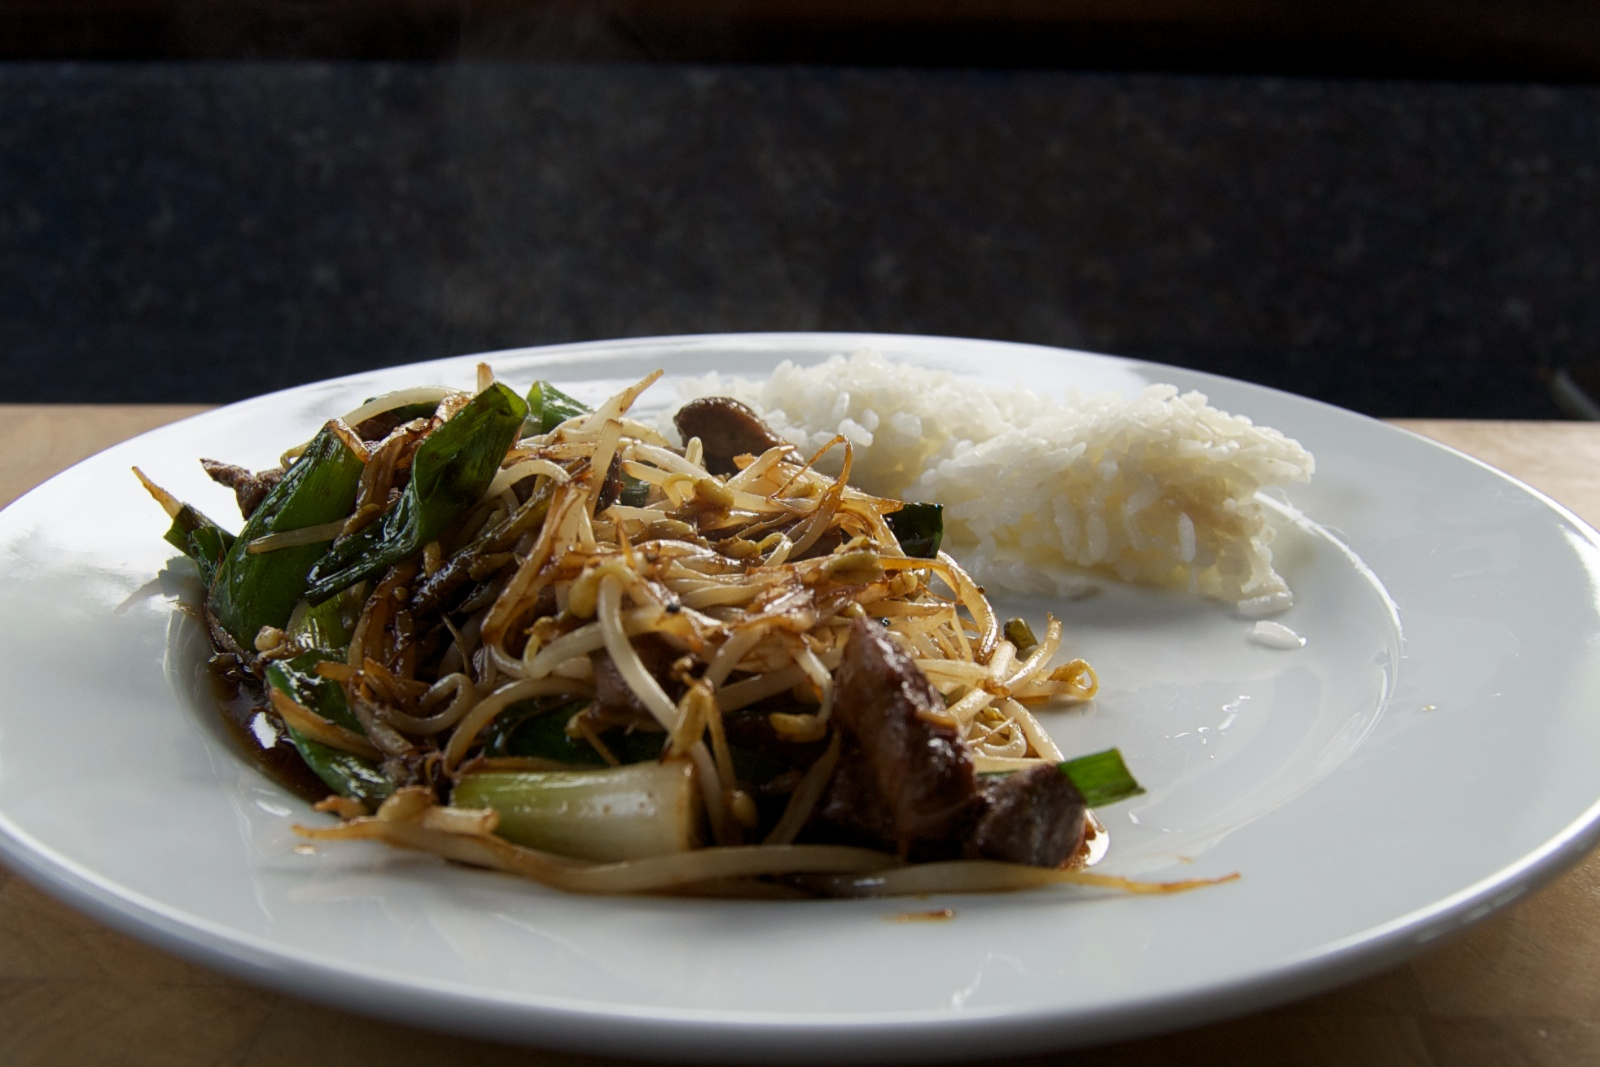 http://blog.rickk.com/food/2012/07/13/ate.2012.07.13.l.jpg